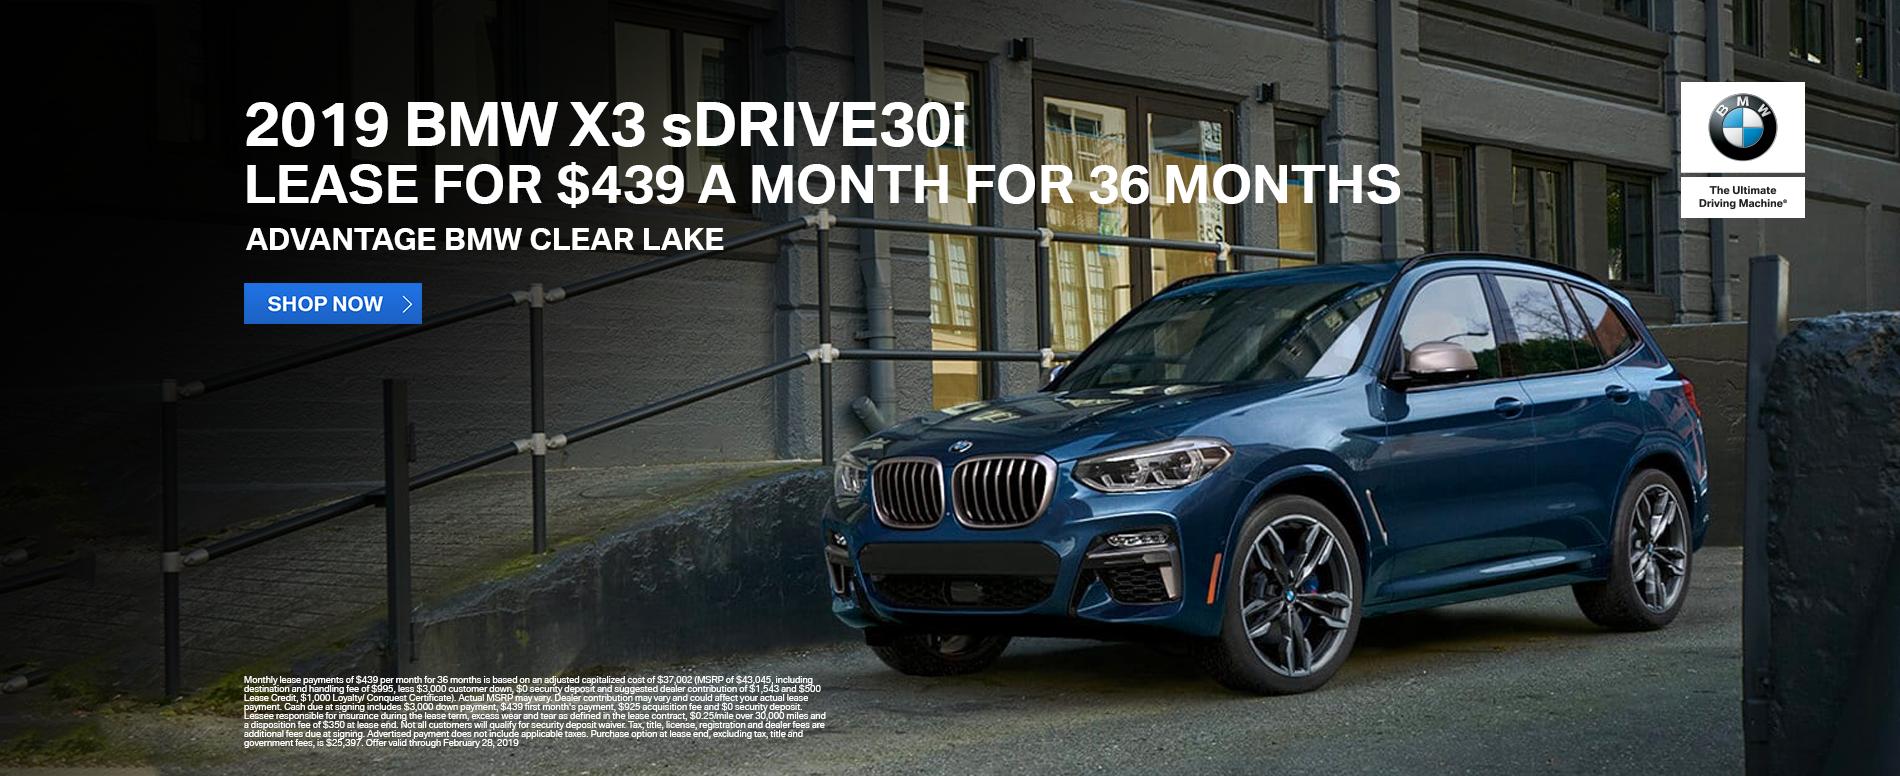 Lease-2019-BMW-X3-sDrive30i-Advantage-ClearLake